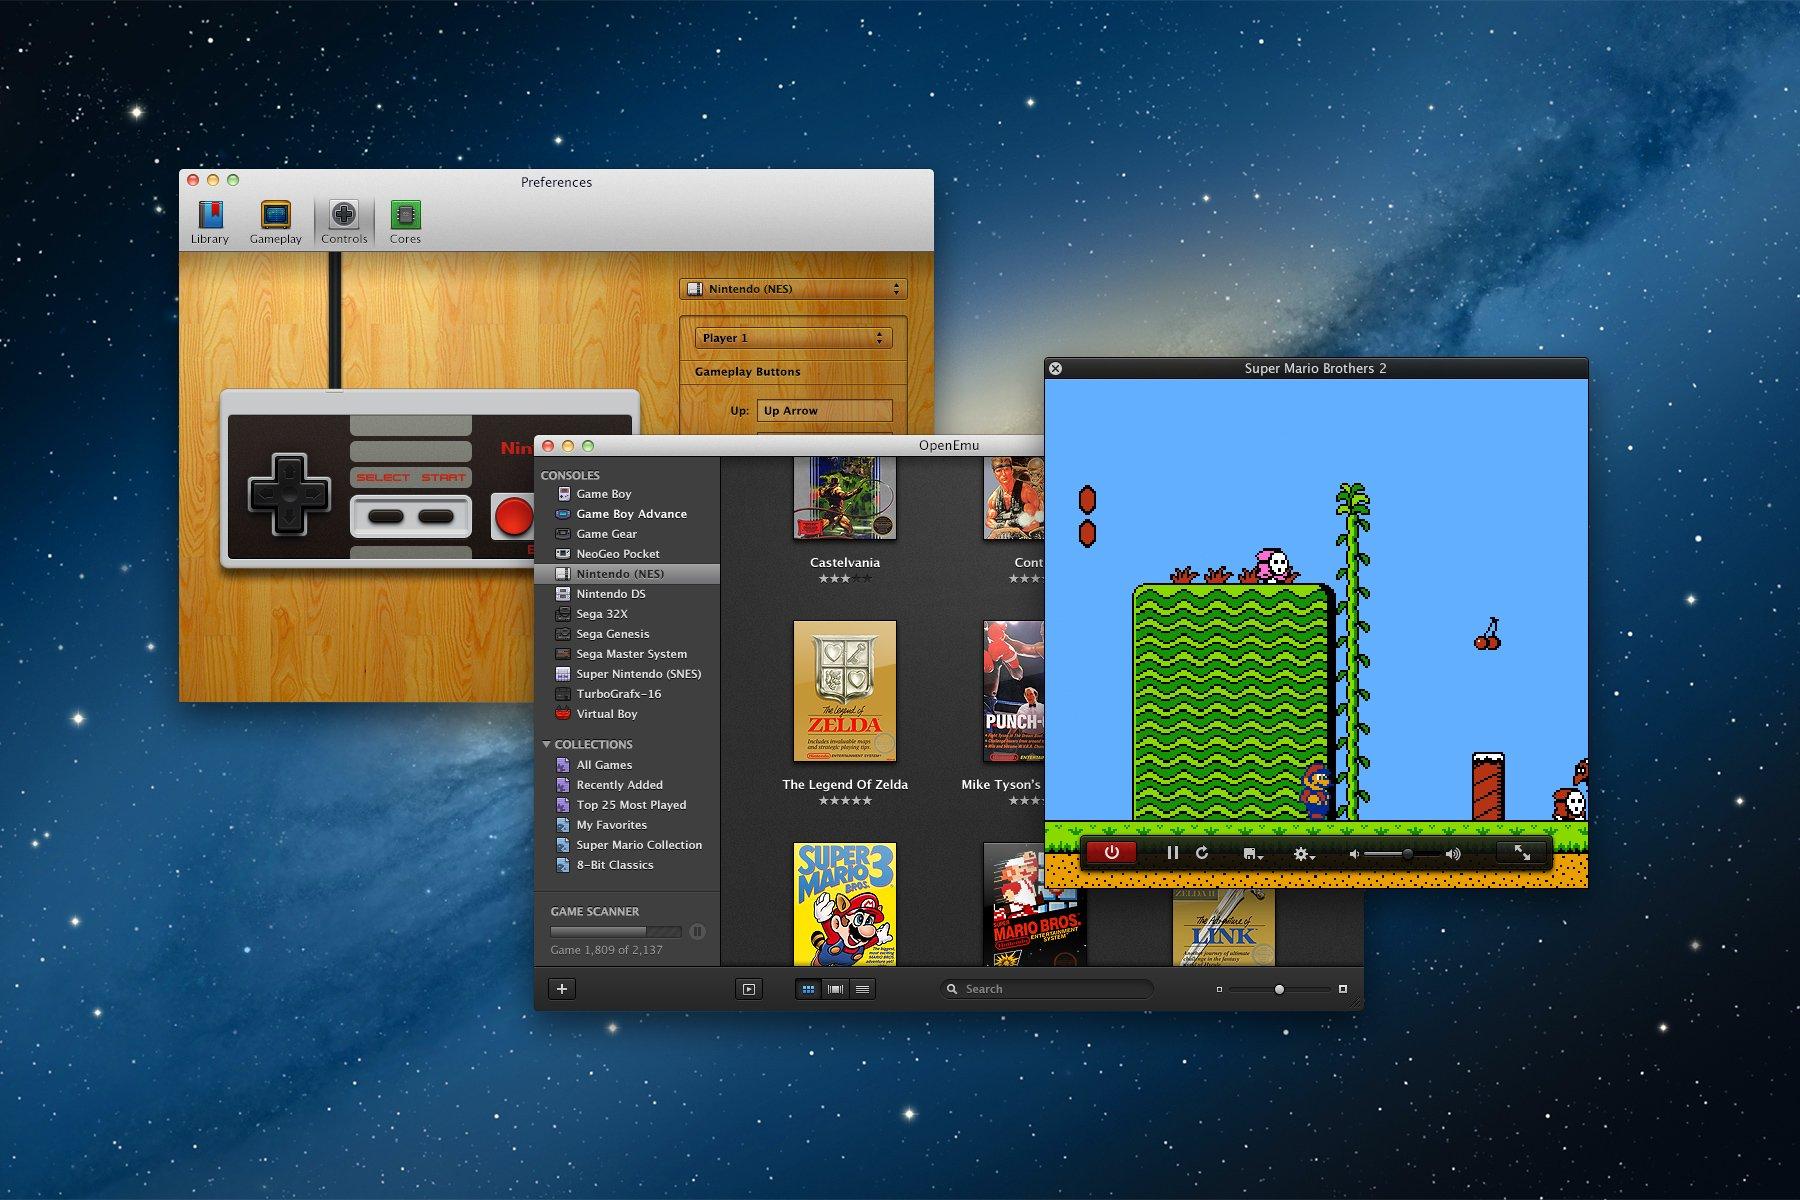 OpenEmu – The Best Retro Gaming Emulator - ChurchMag